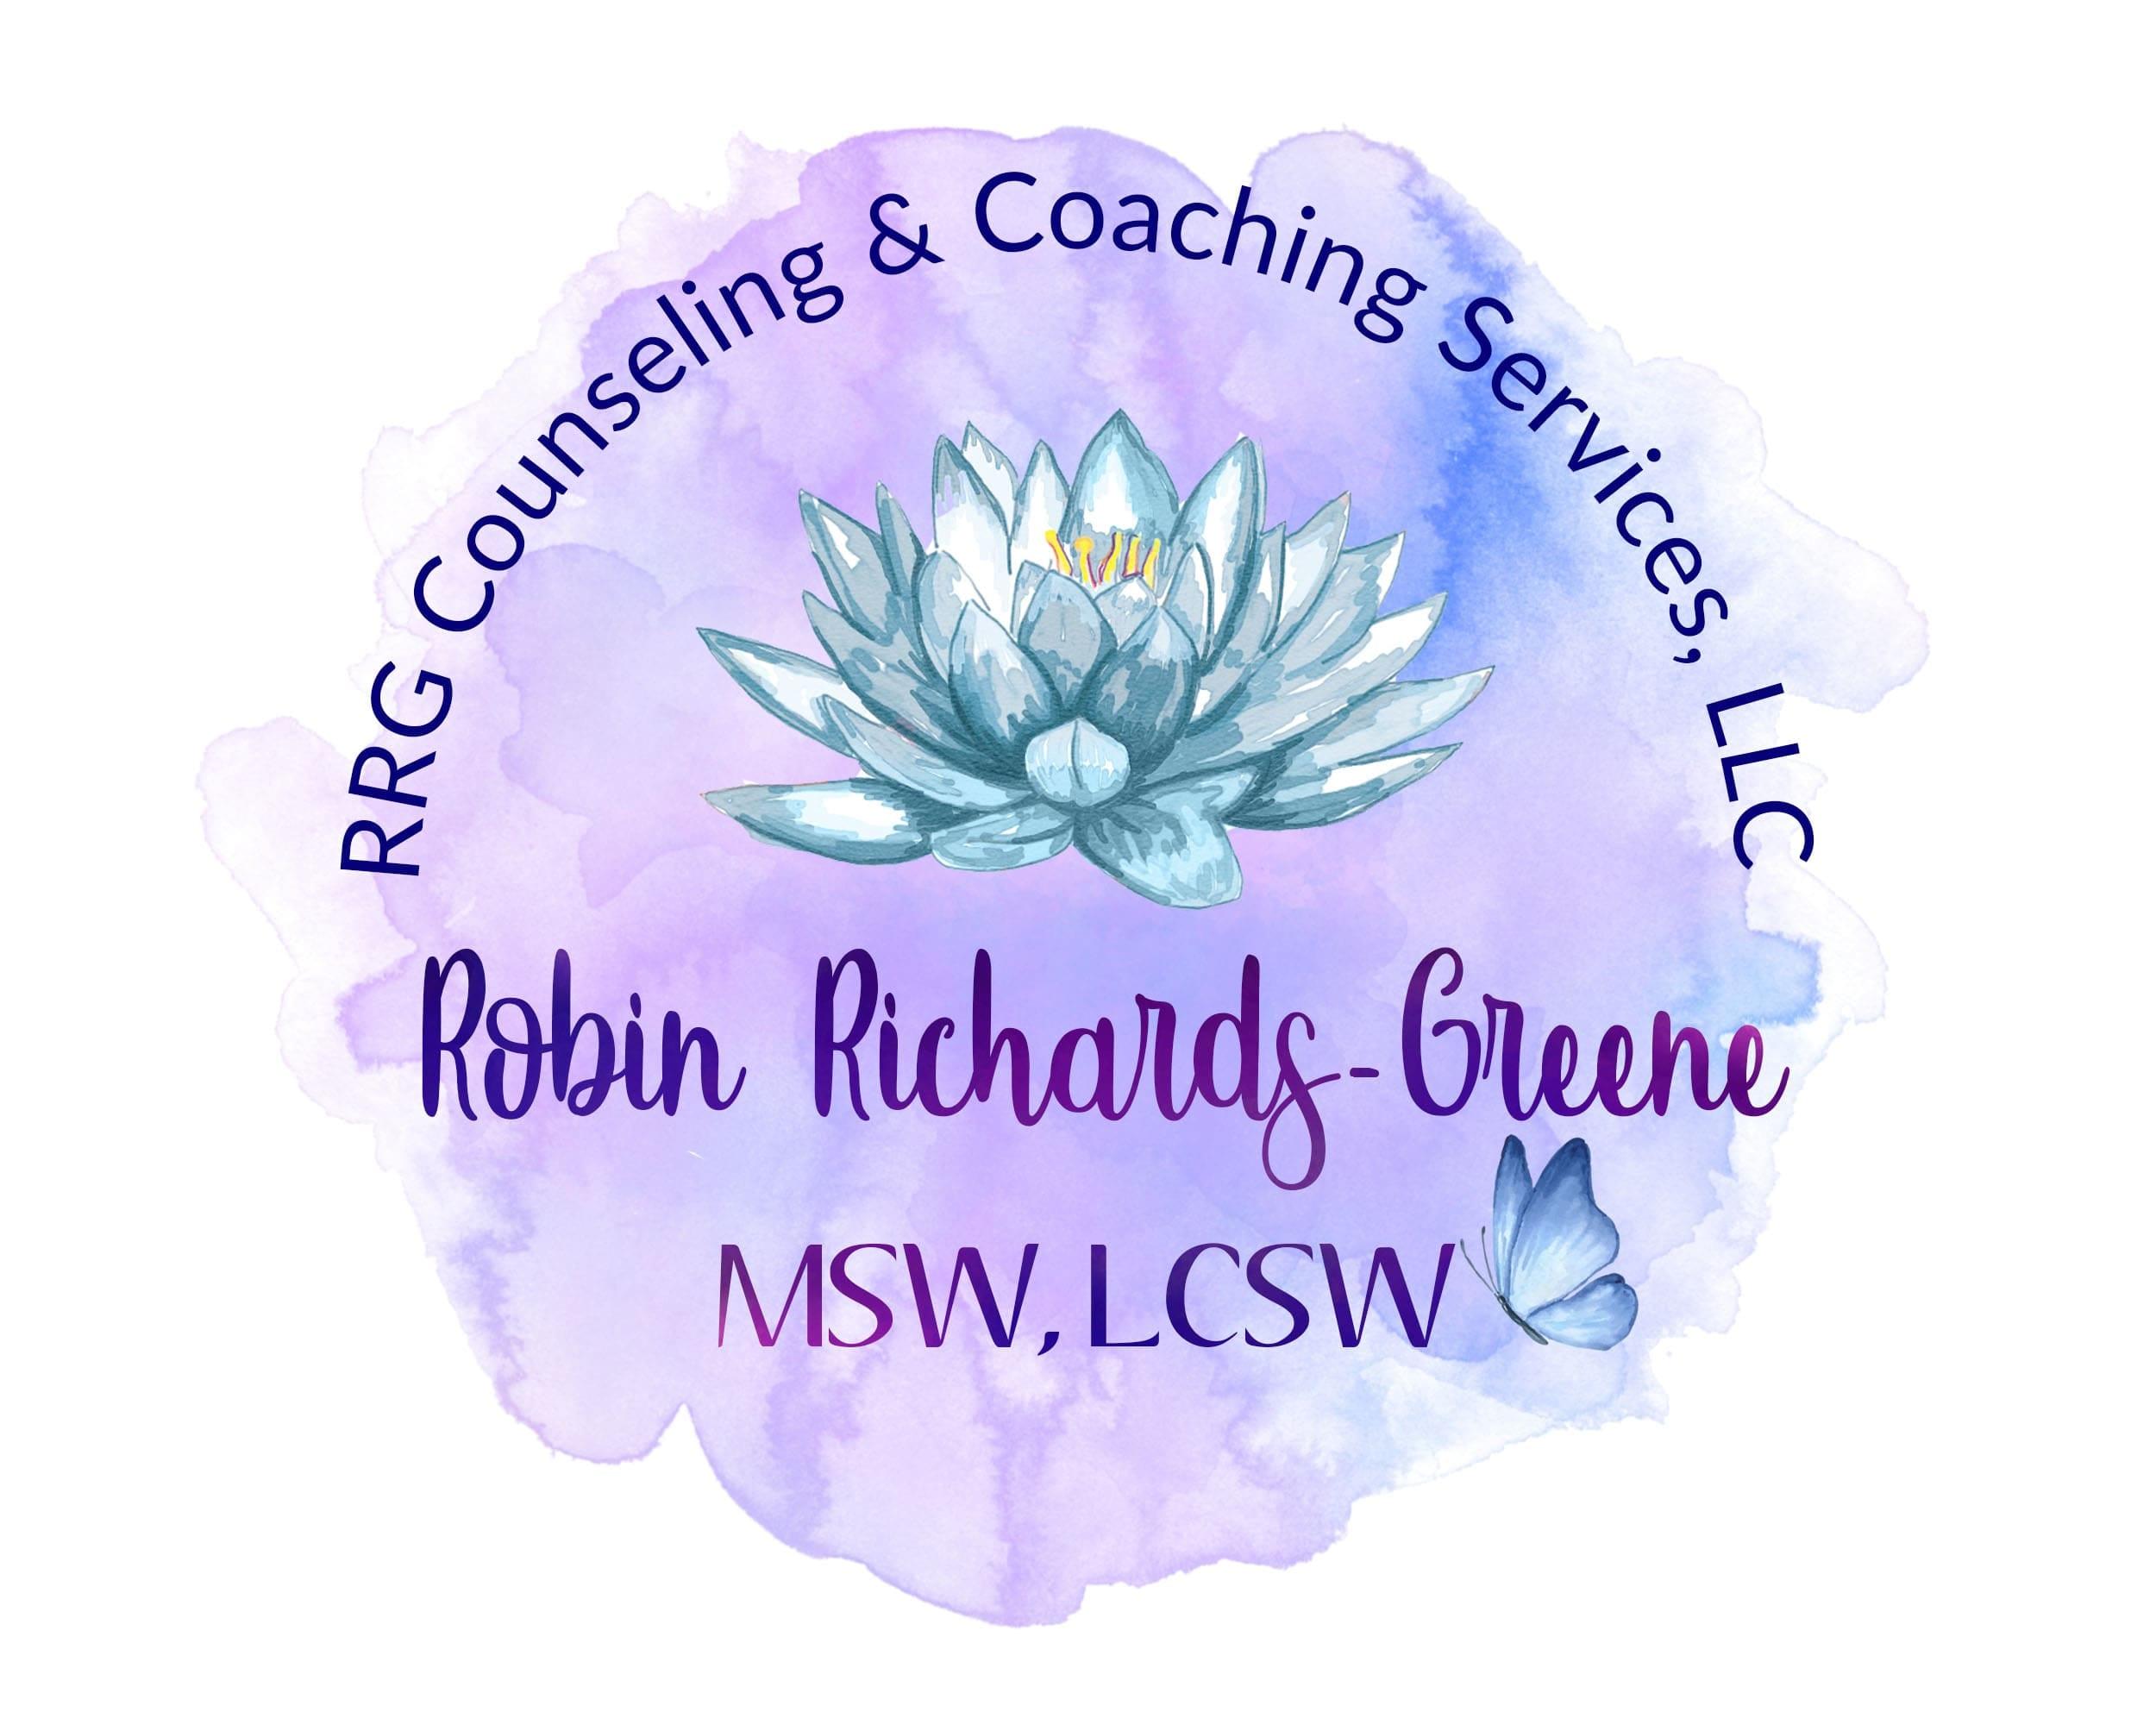 Robin Richards-Greene, MSW, LCSW